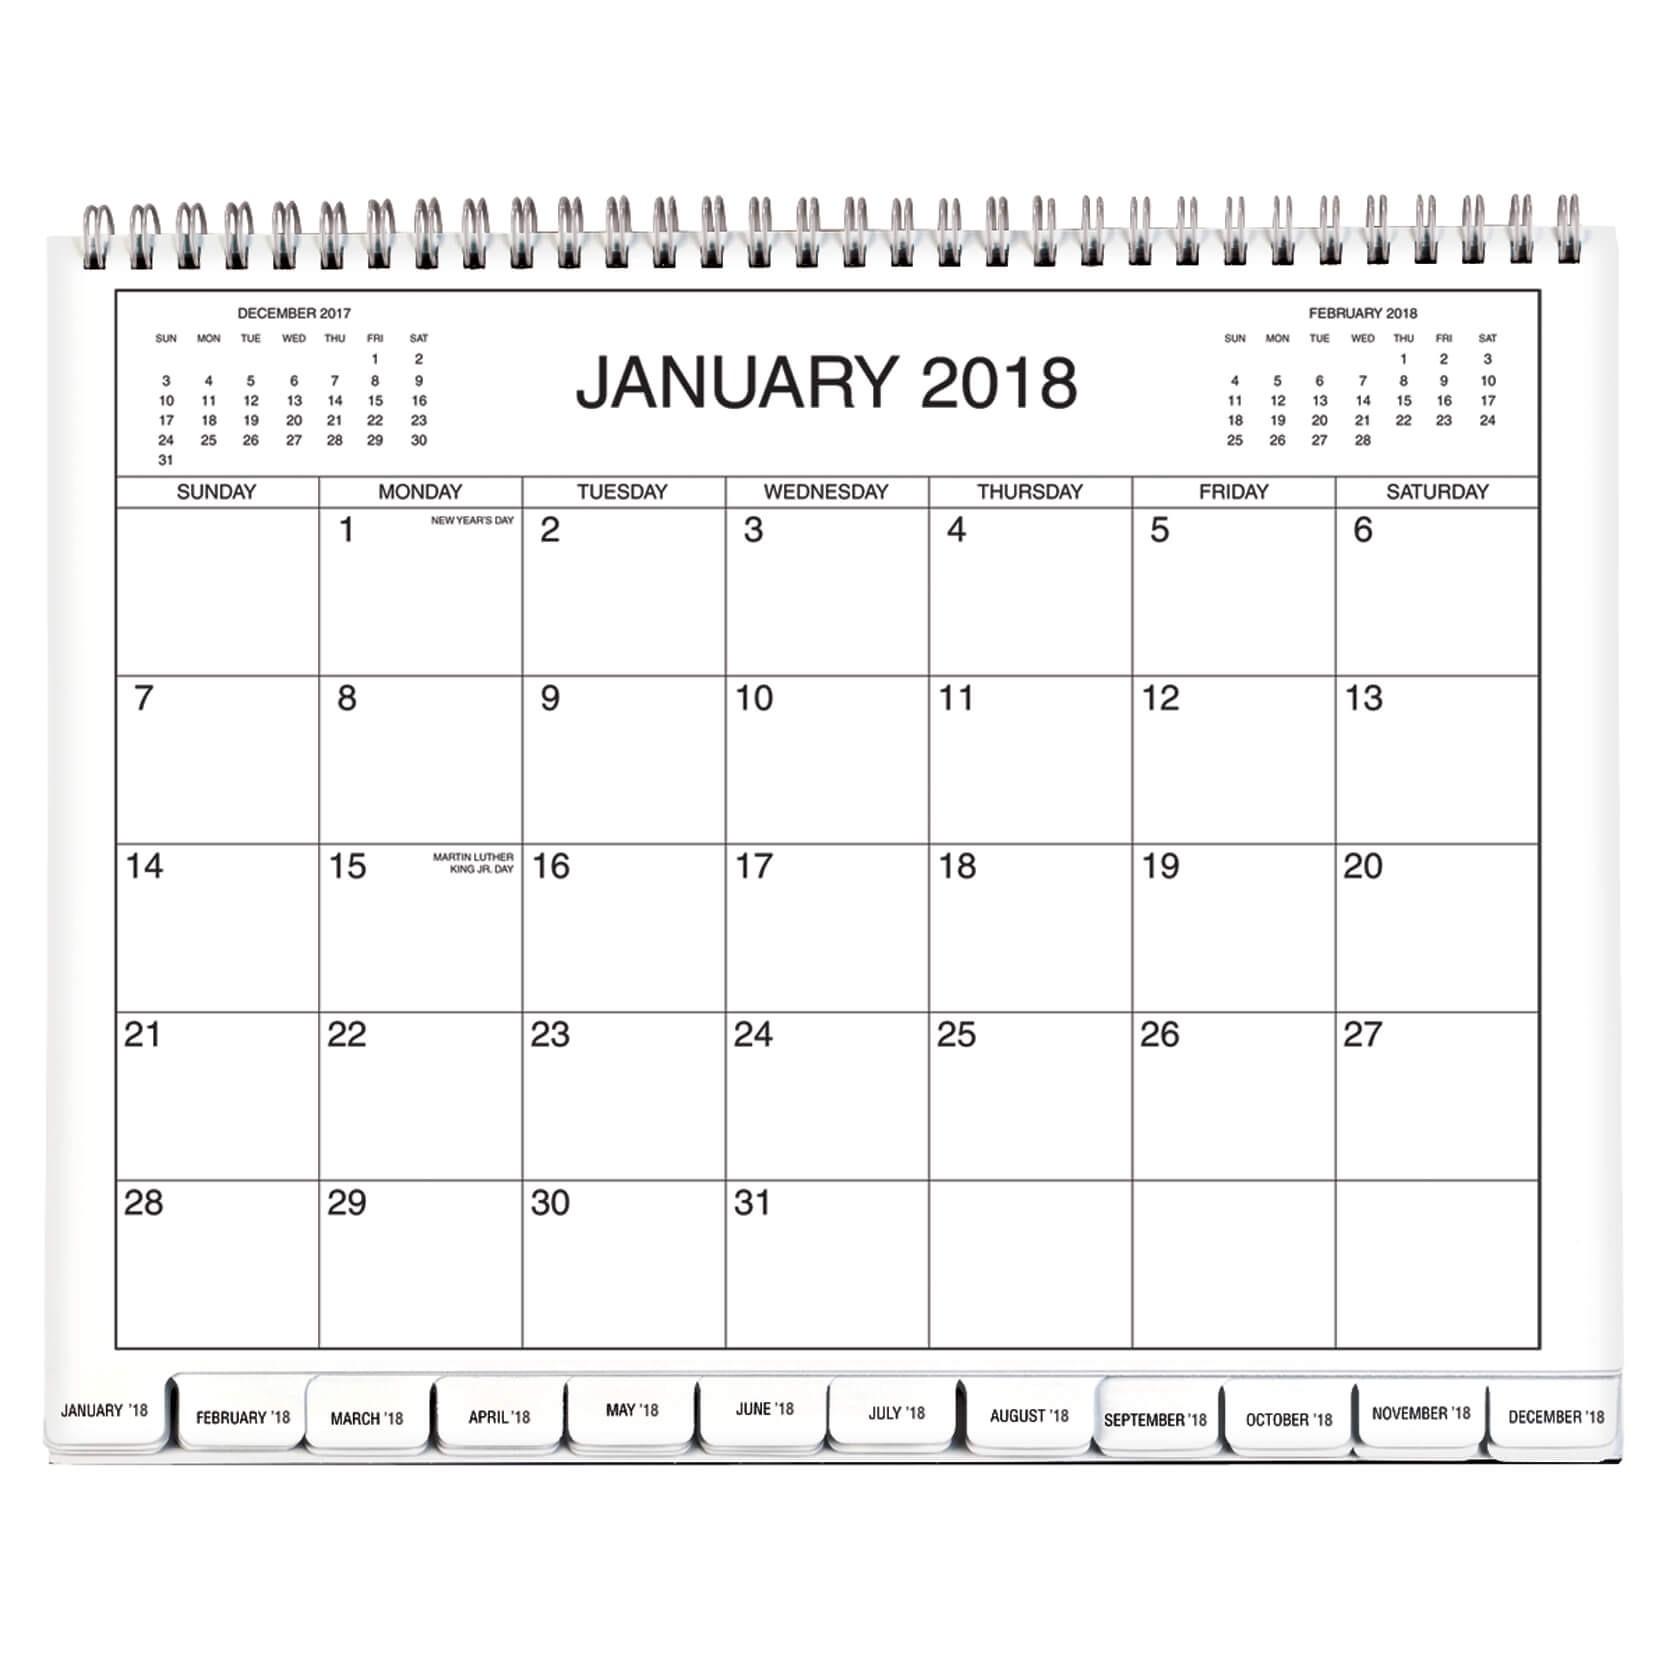 5 Year Calendar 2018-2019-2020-2021-2022 - Monthly Calendar  2020 Calendar With Open Squares